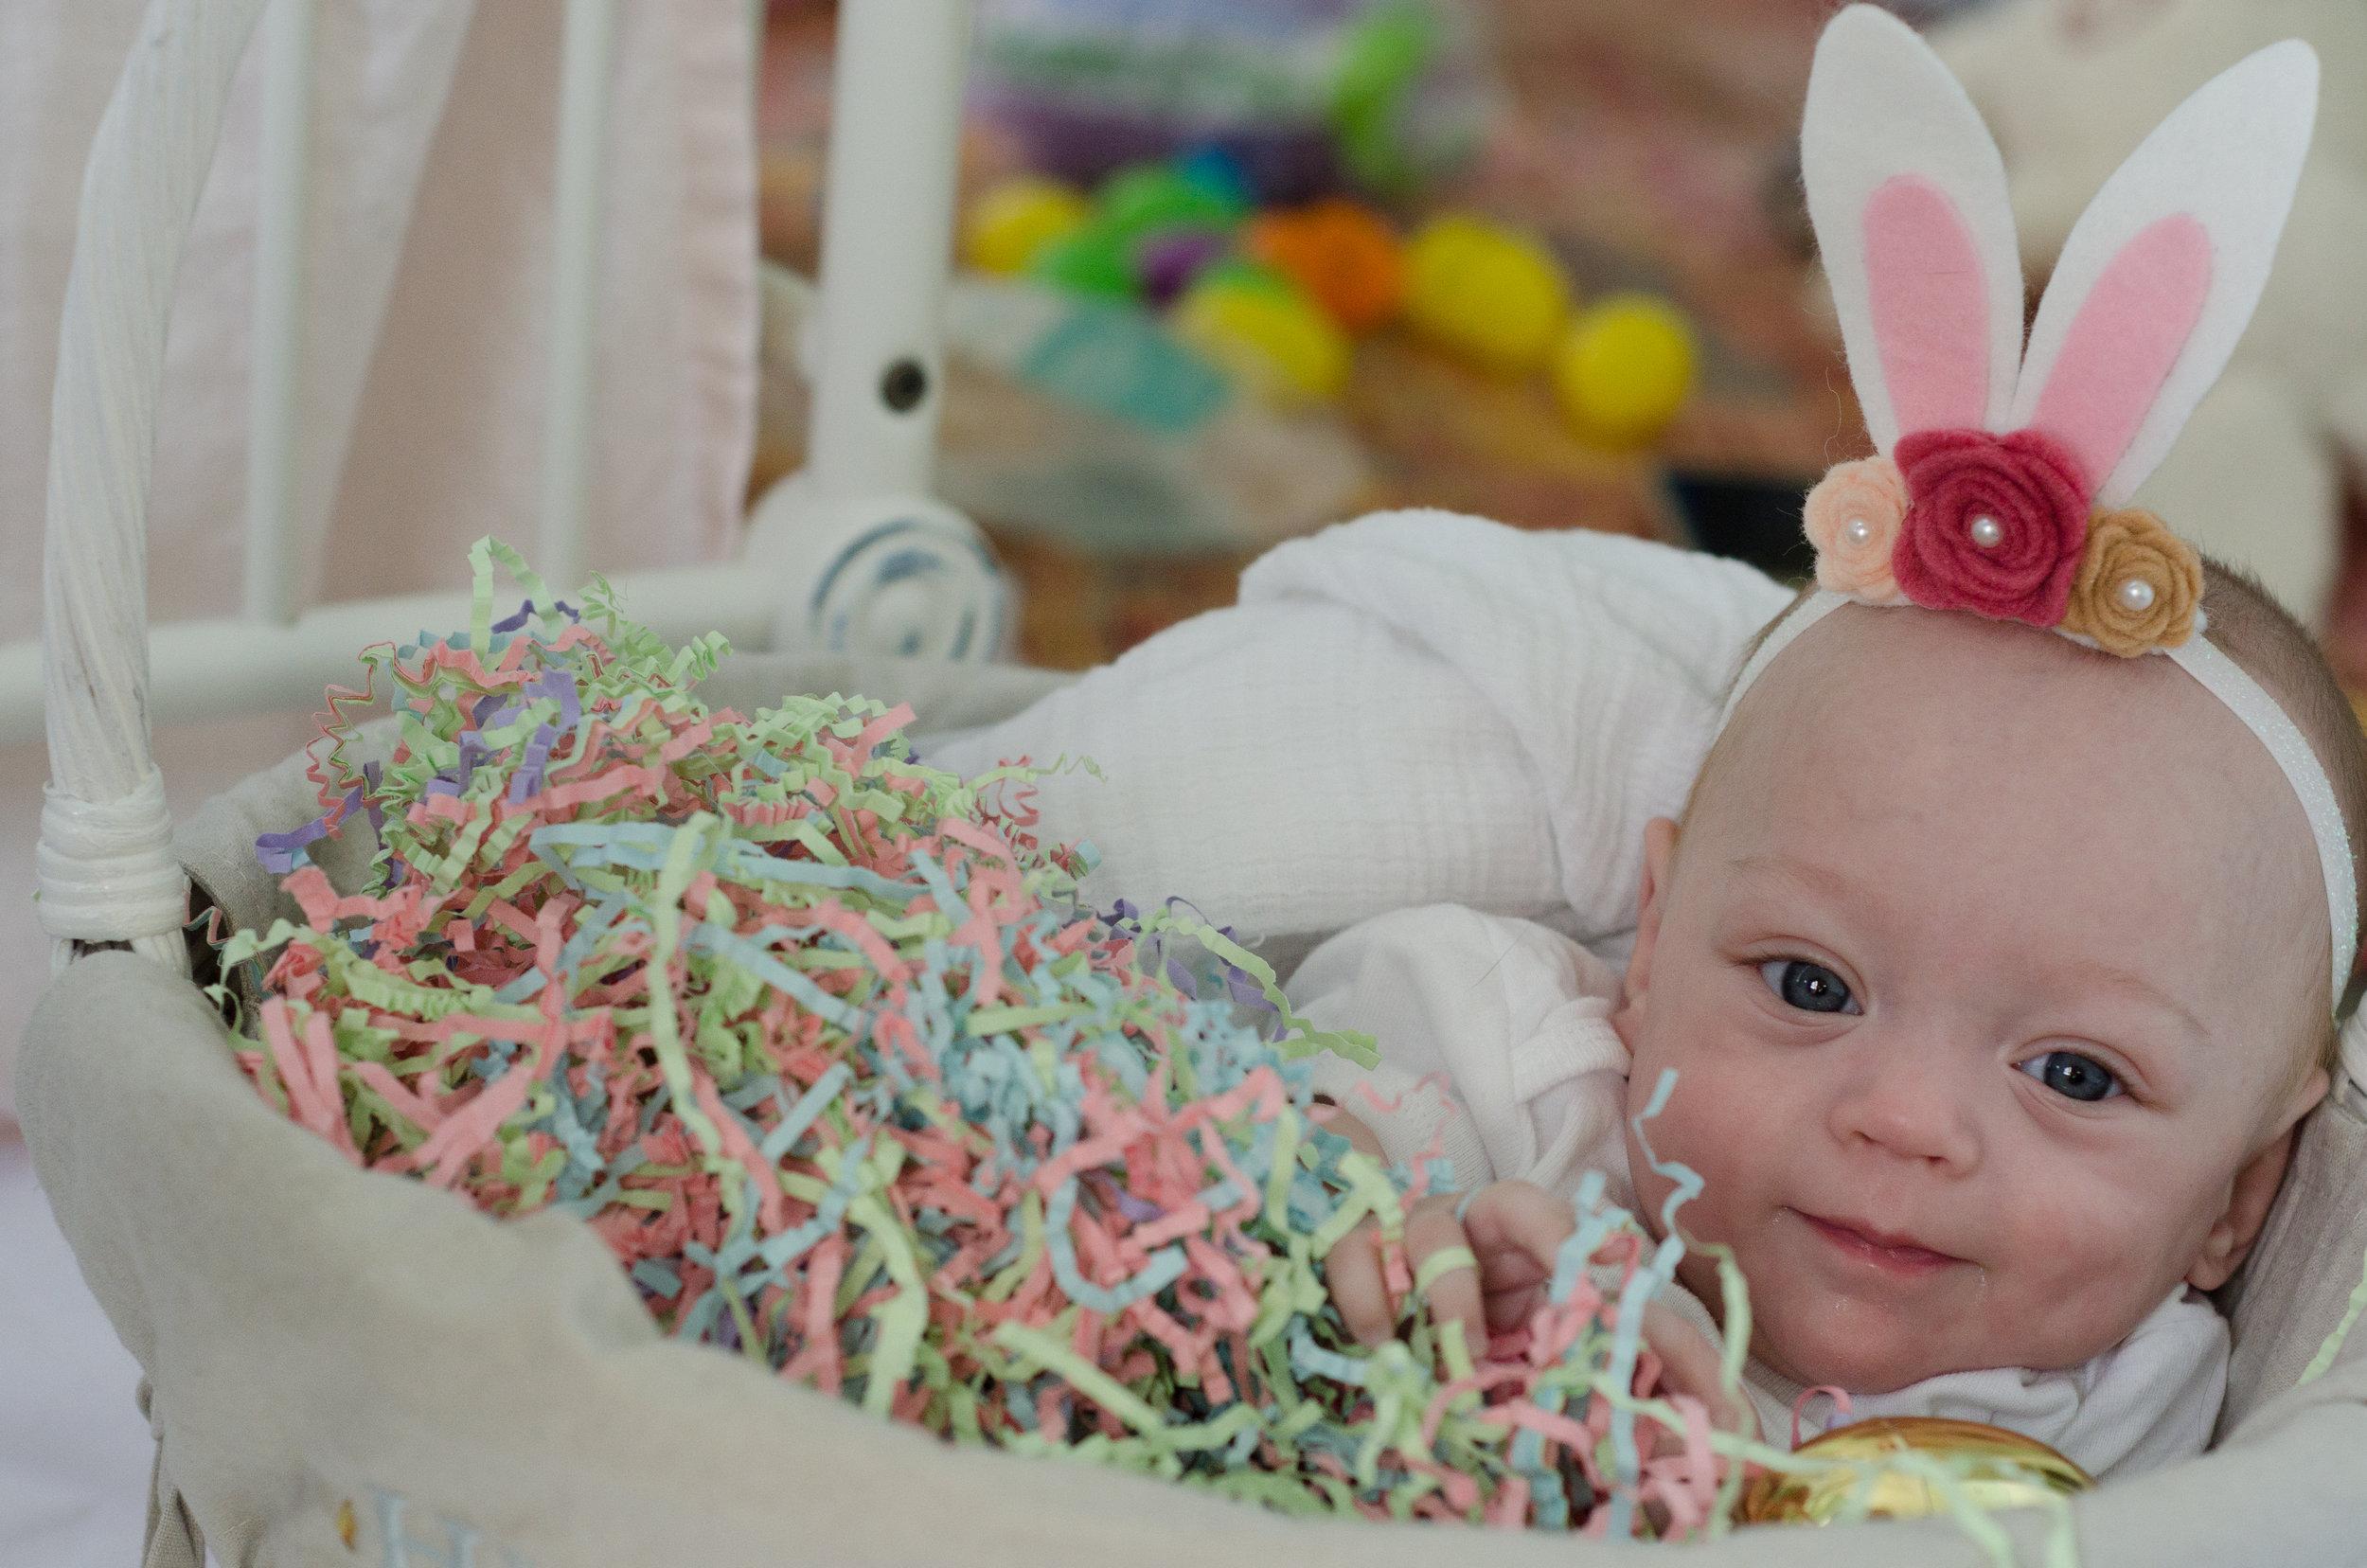 Candy Free Easter Basket Ideas - shegotguts.com